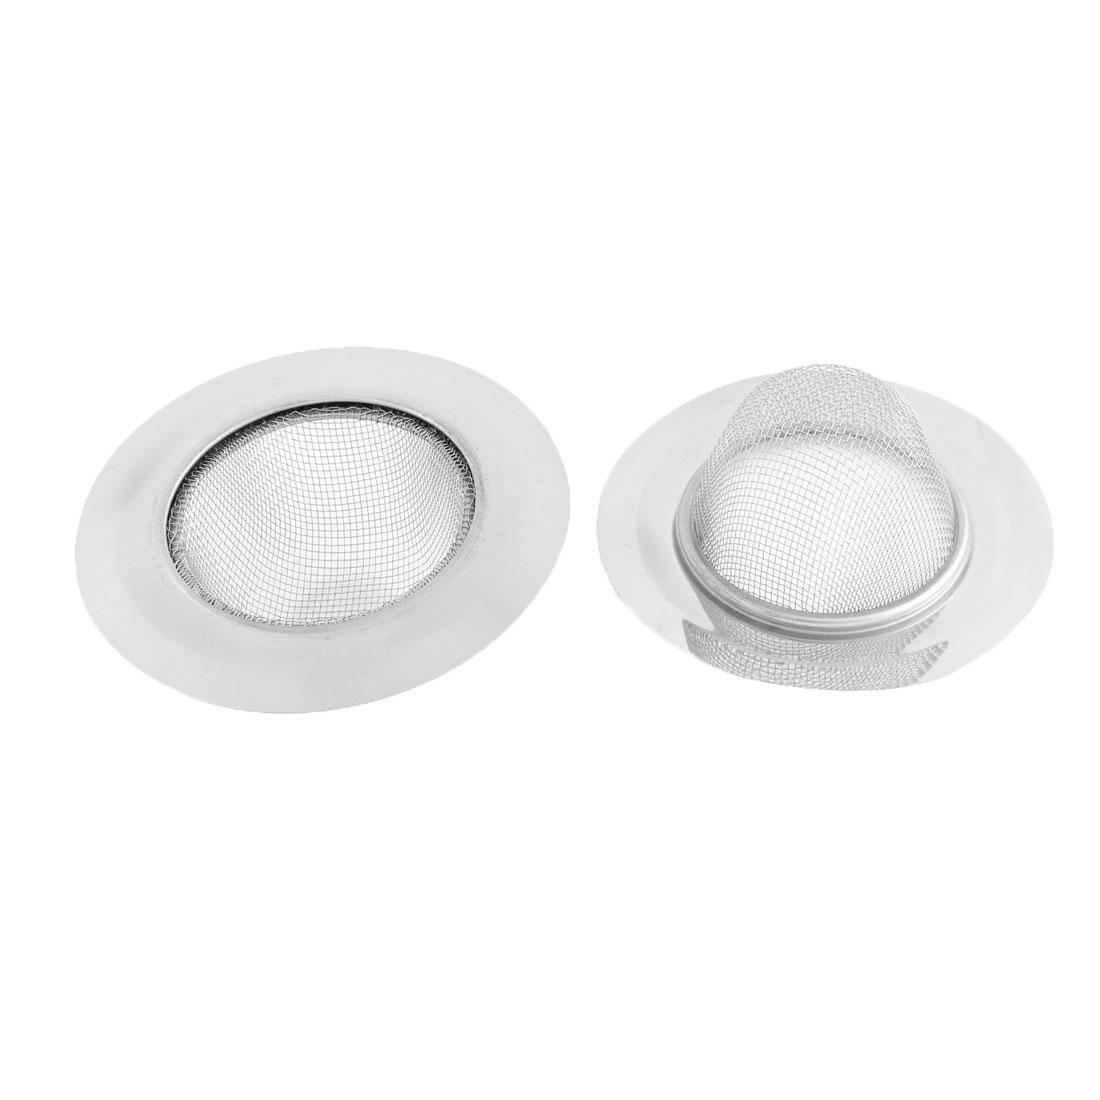 Bathroom Metal Net Hole Design Basin Bathtub Sink Drain Strainer Stopper Basket 11.5cm Dia 2pcs